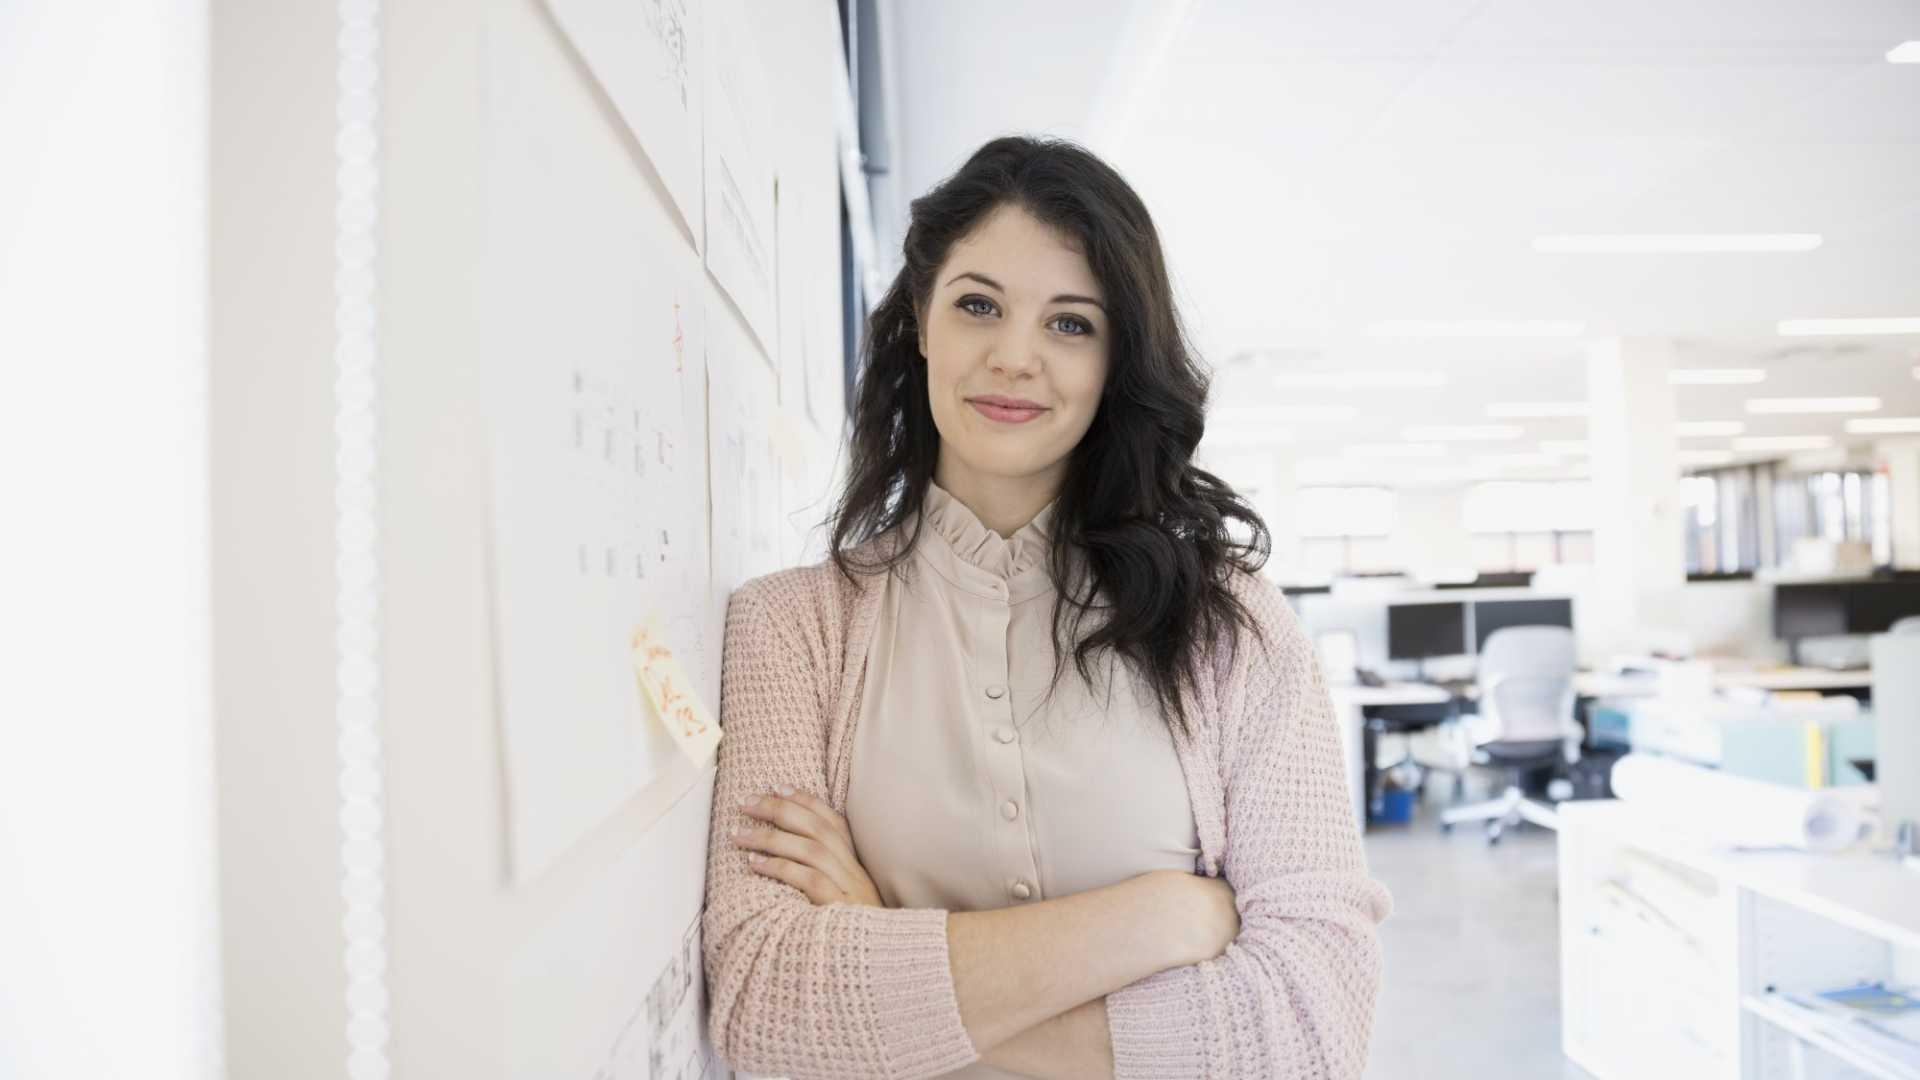 Women Entrepreneurs Are Crushing It in 2016